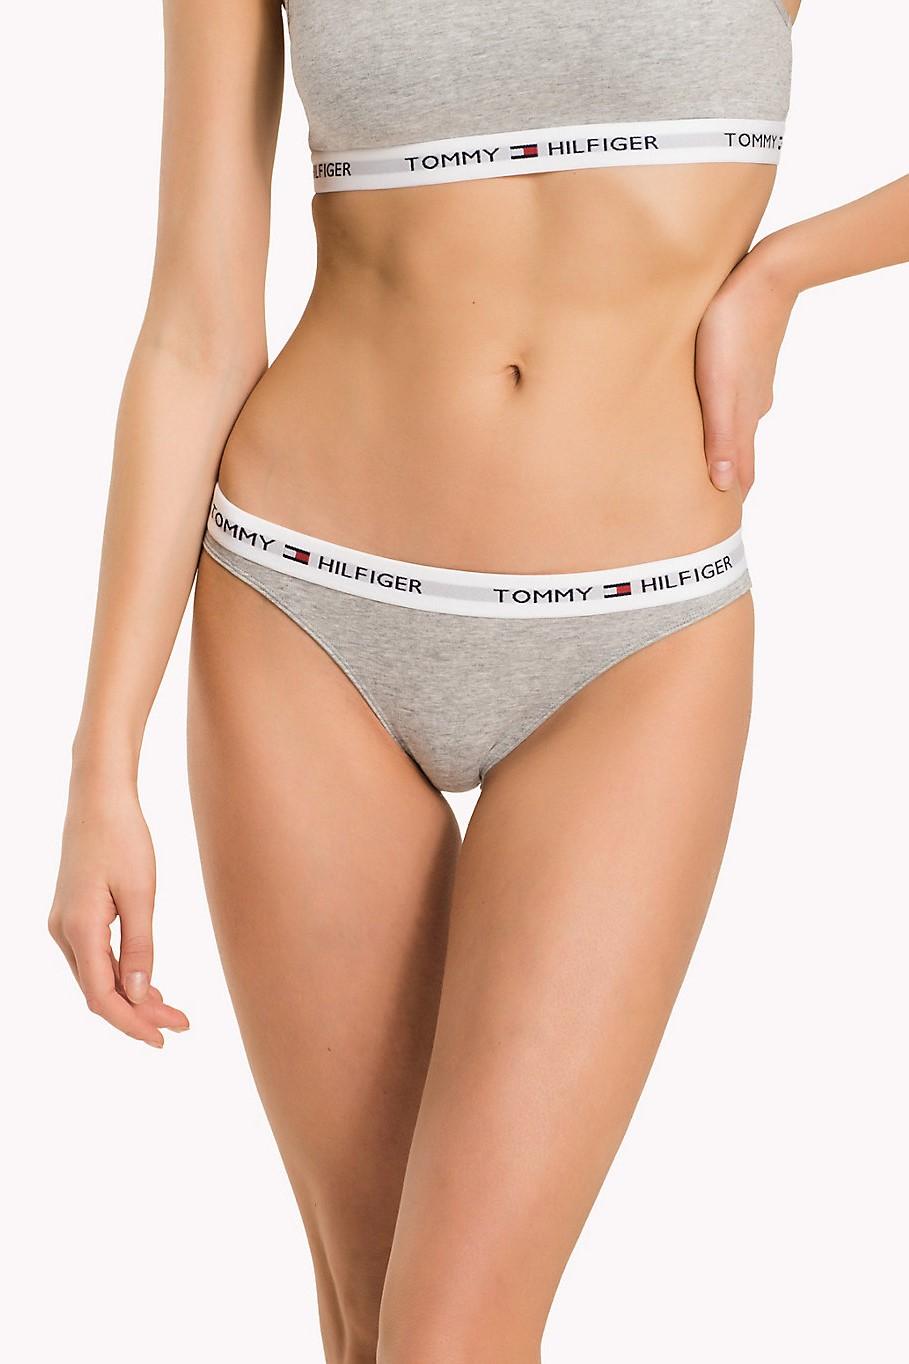 af76d5ef3a89 Tommy Hilfiger chiloti gri de dama Bikini Iconic